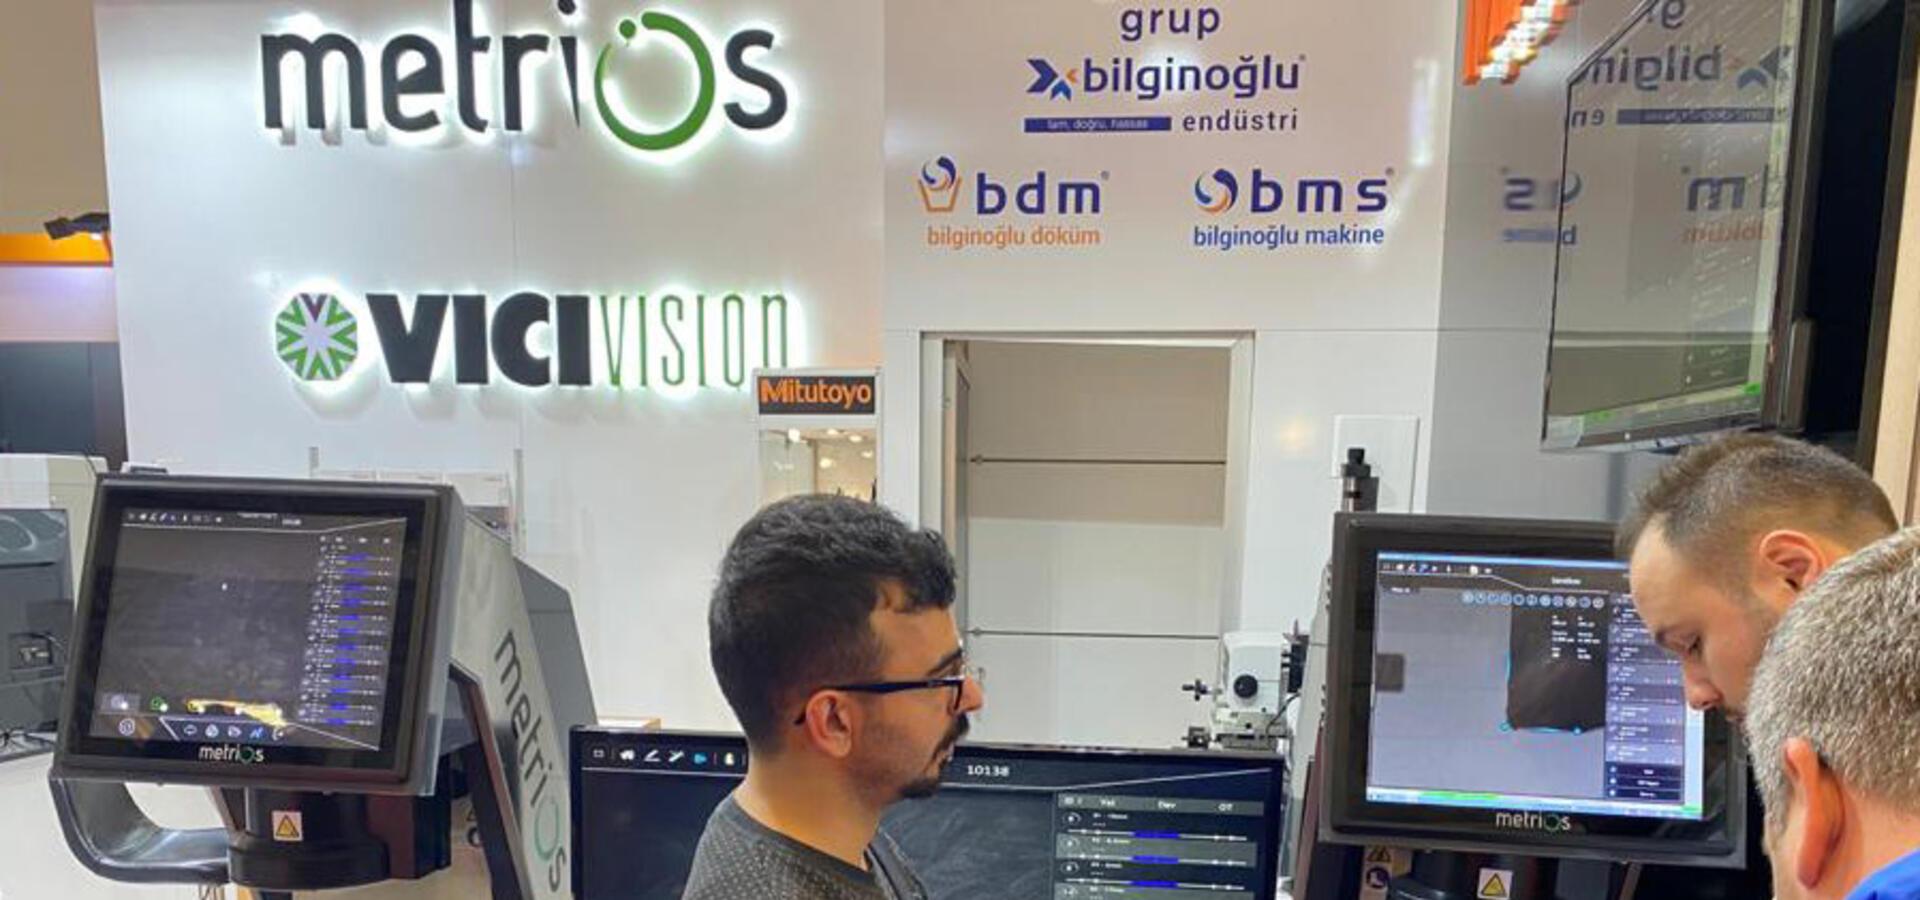 metrios it fastener-2020-istanbul-turchia 003